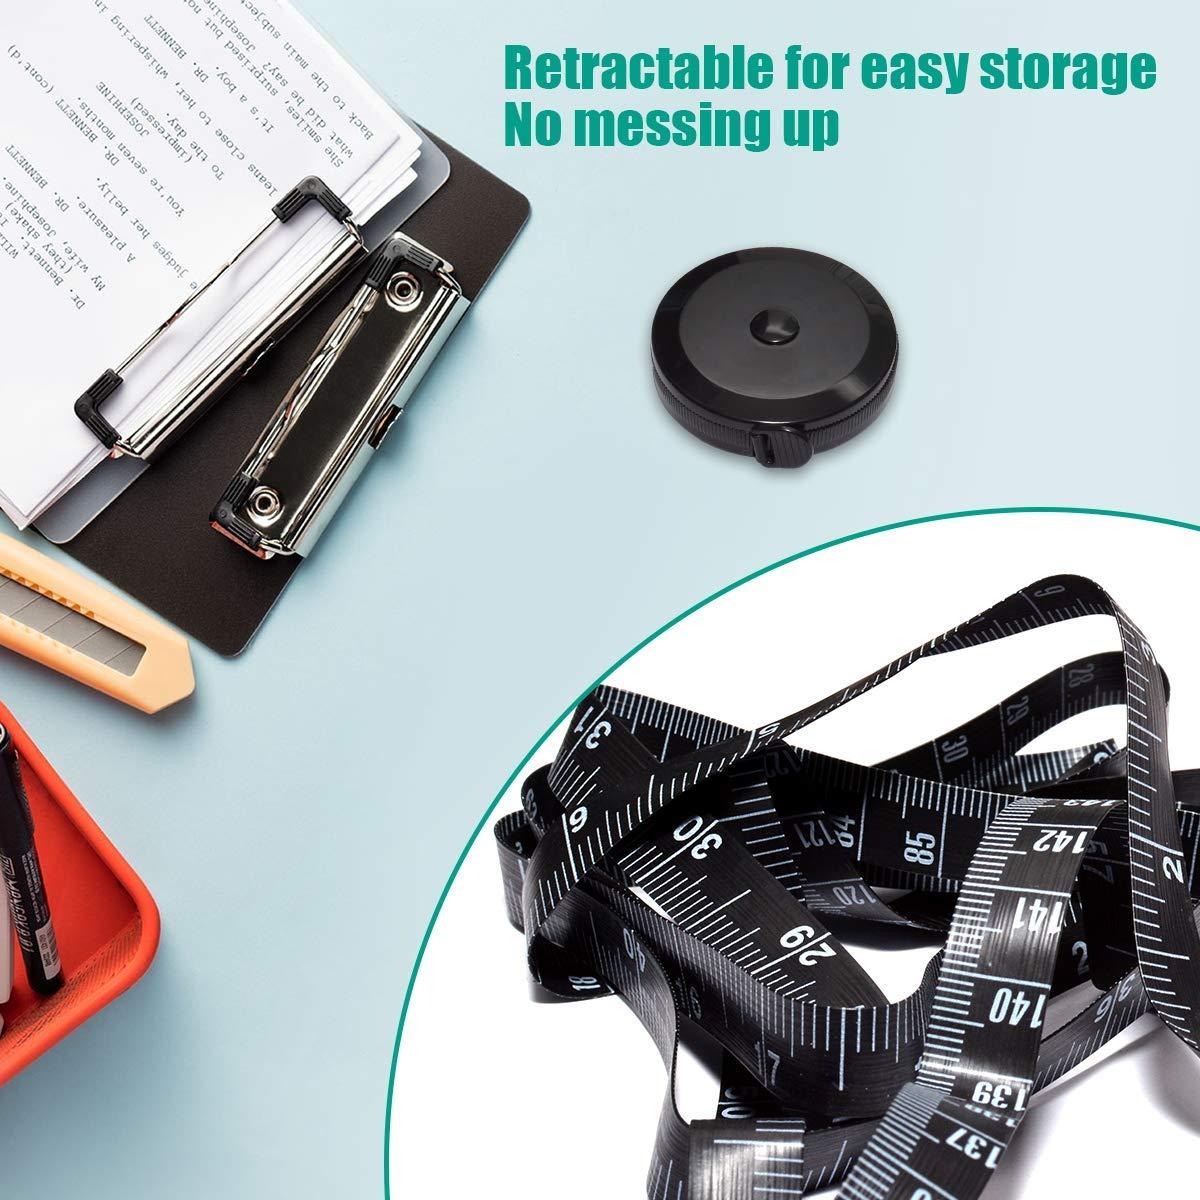 EPRHY Tape Measure for Body Measuring Tape Body Cloth Measuring Tape for Sewing Tailor Fabric Measurements Tape